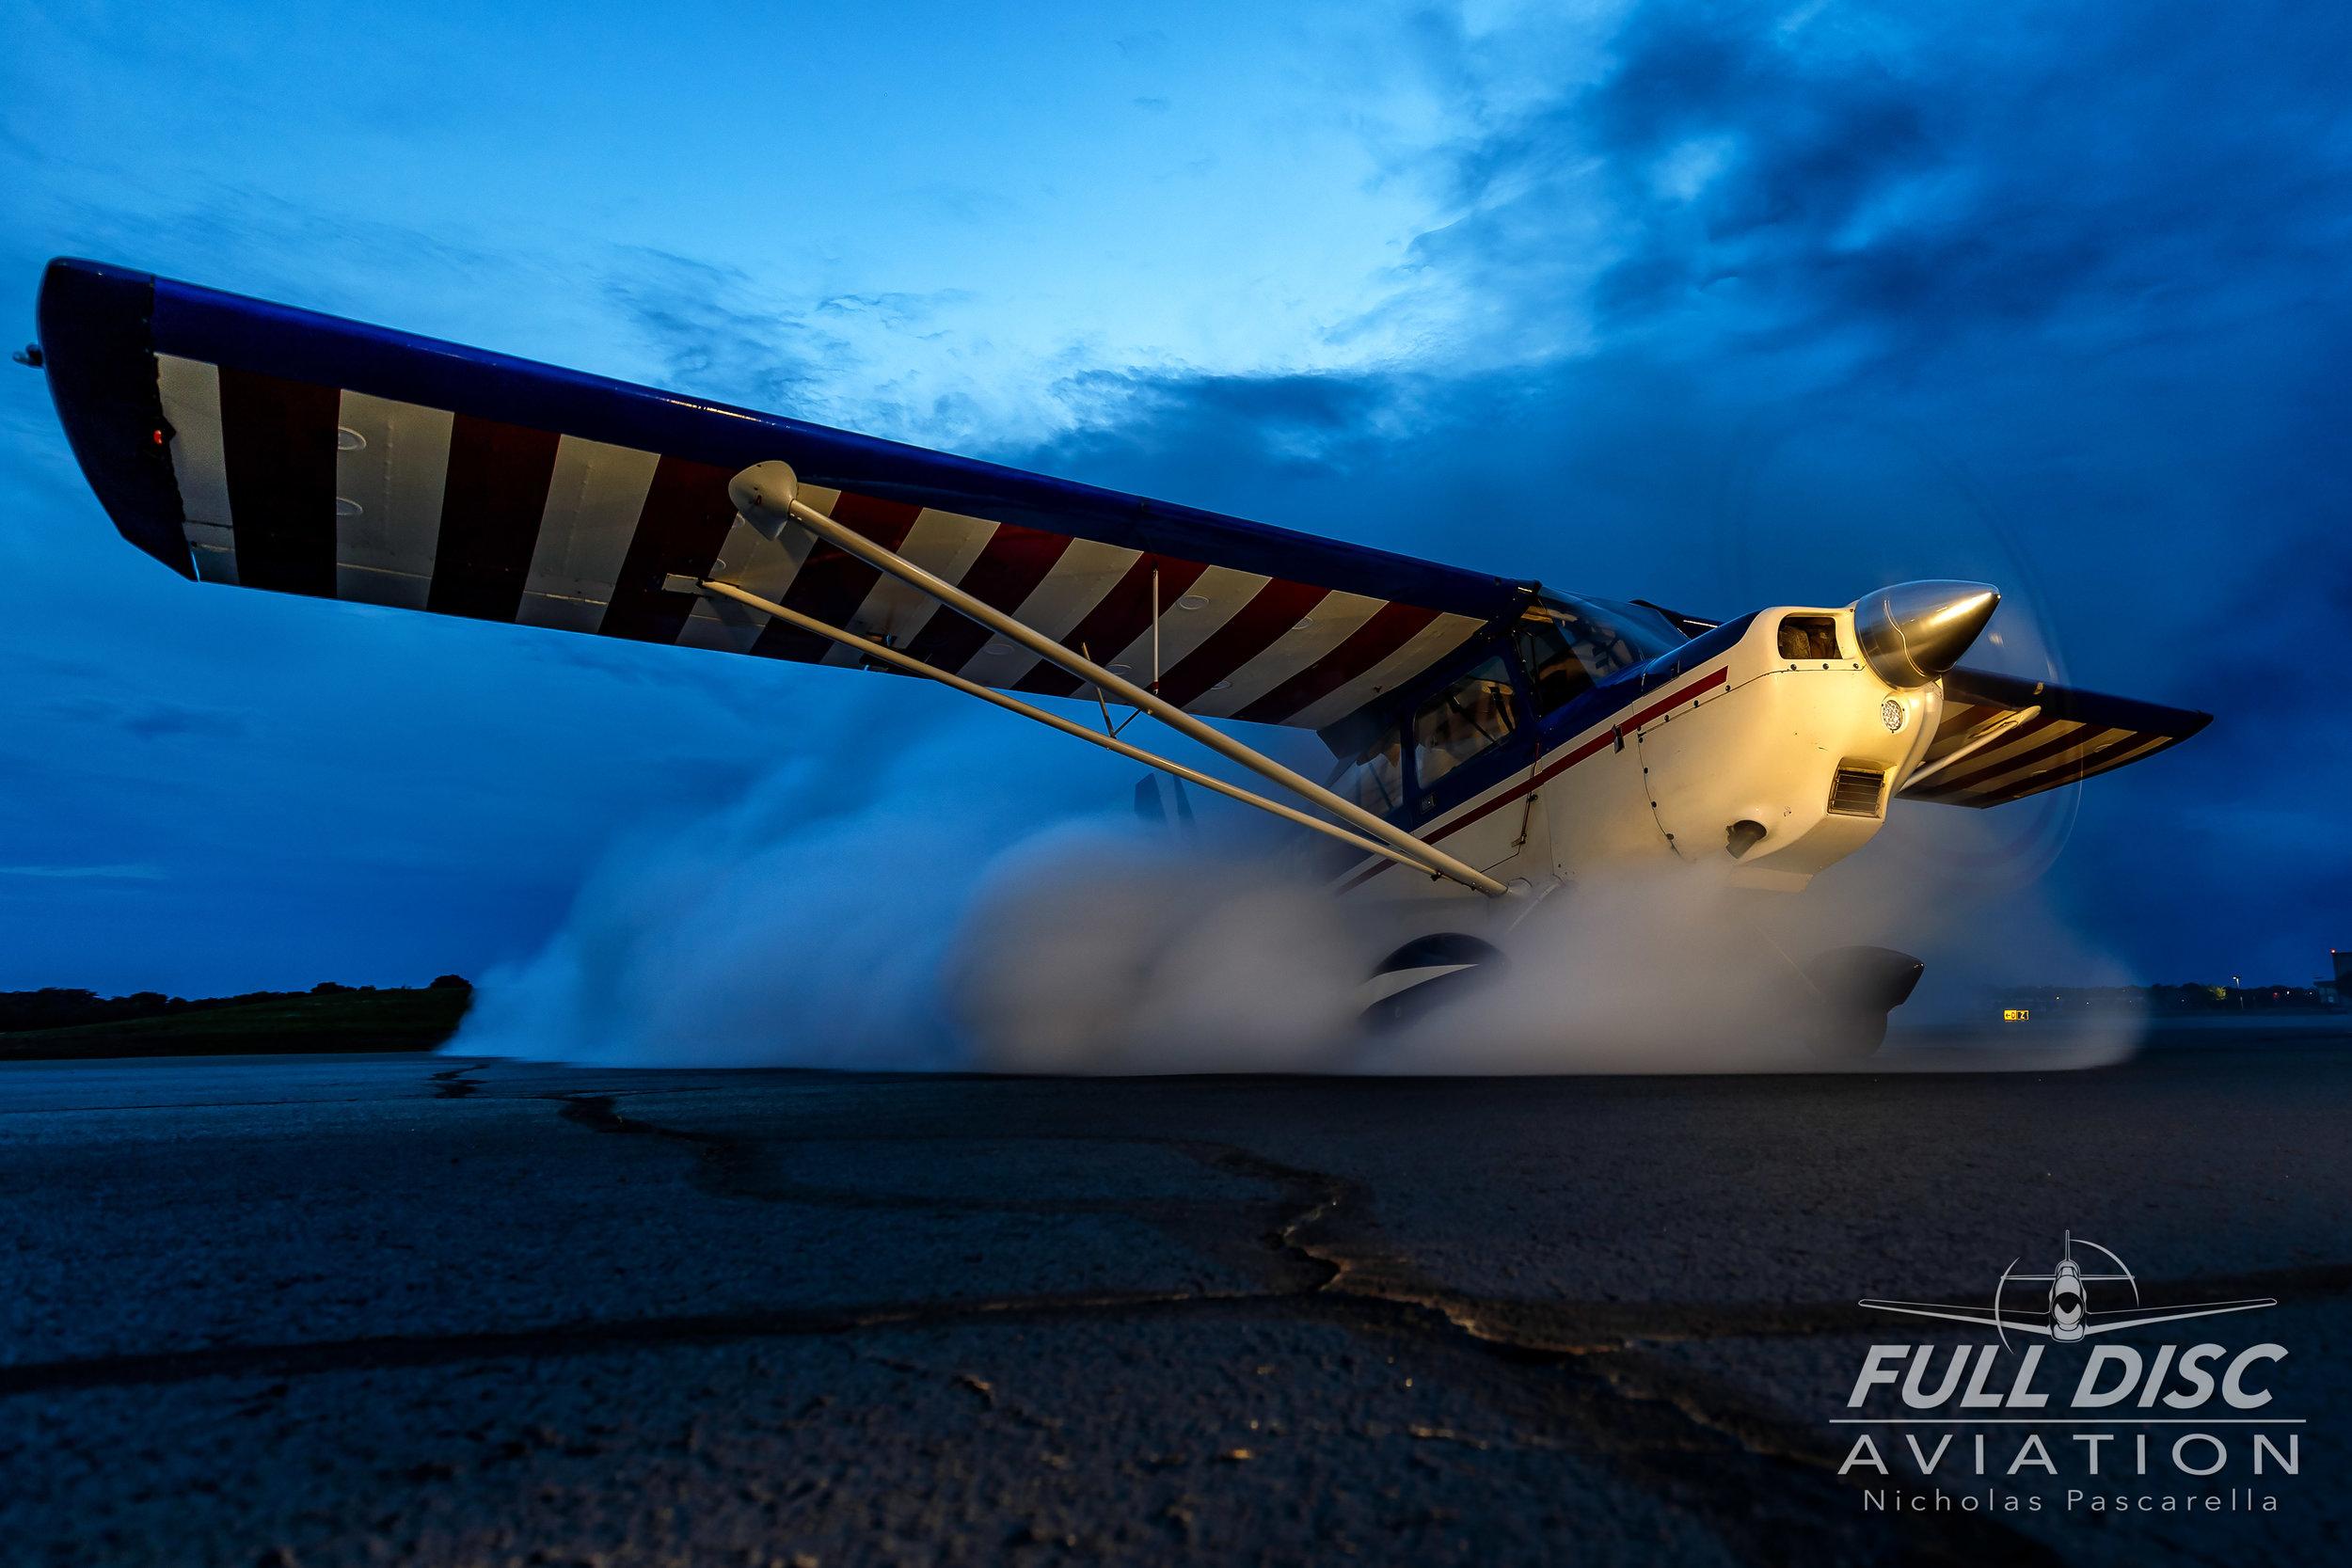 rjgritter_smokeshow_smoke_rjgritter_decathalon_pilot_portrait_nightshoot__aviation__nickpascarella_nicholaspascarella_fulldiscaviation_leasewebmanassasairshow.jpg.jpg